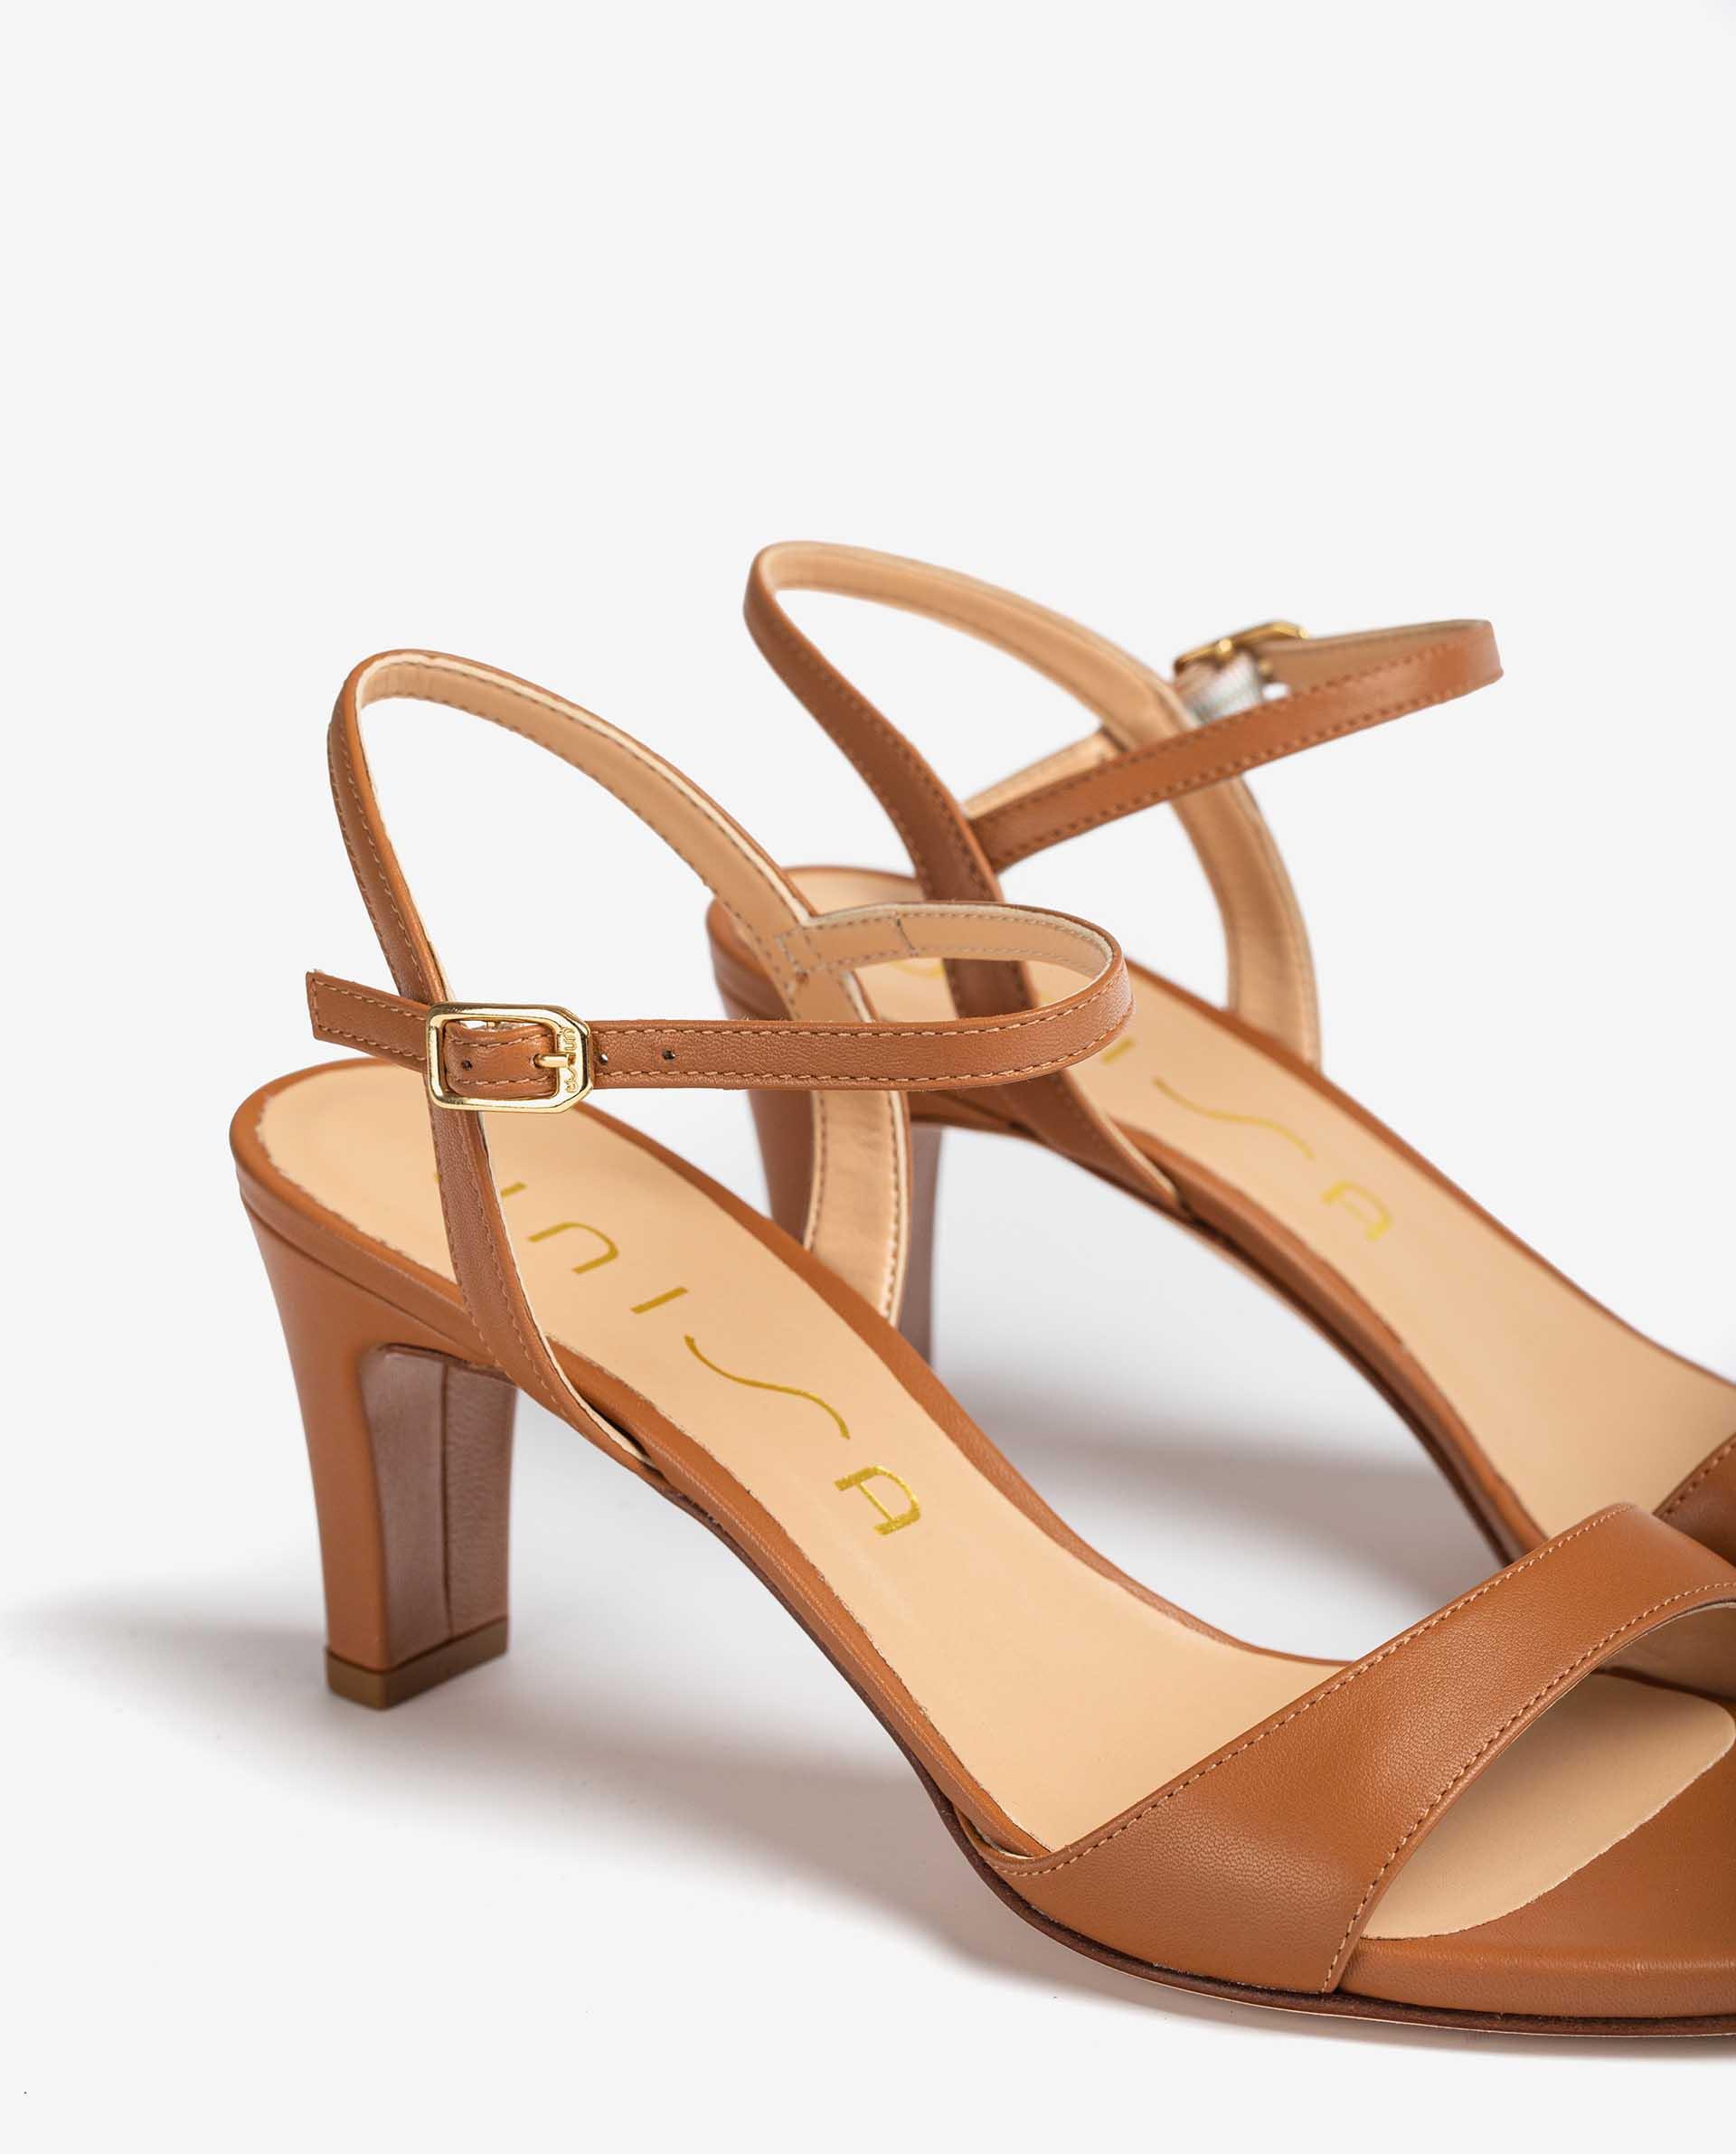 Unisa Sandals MECHI_21_NA bisquit